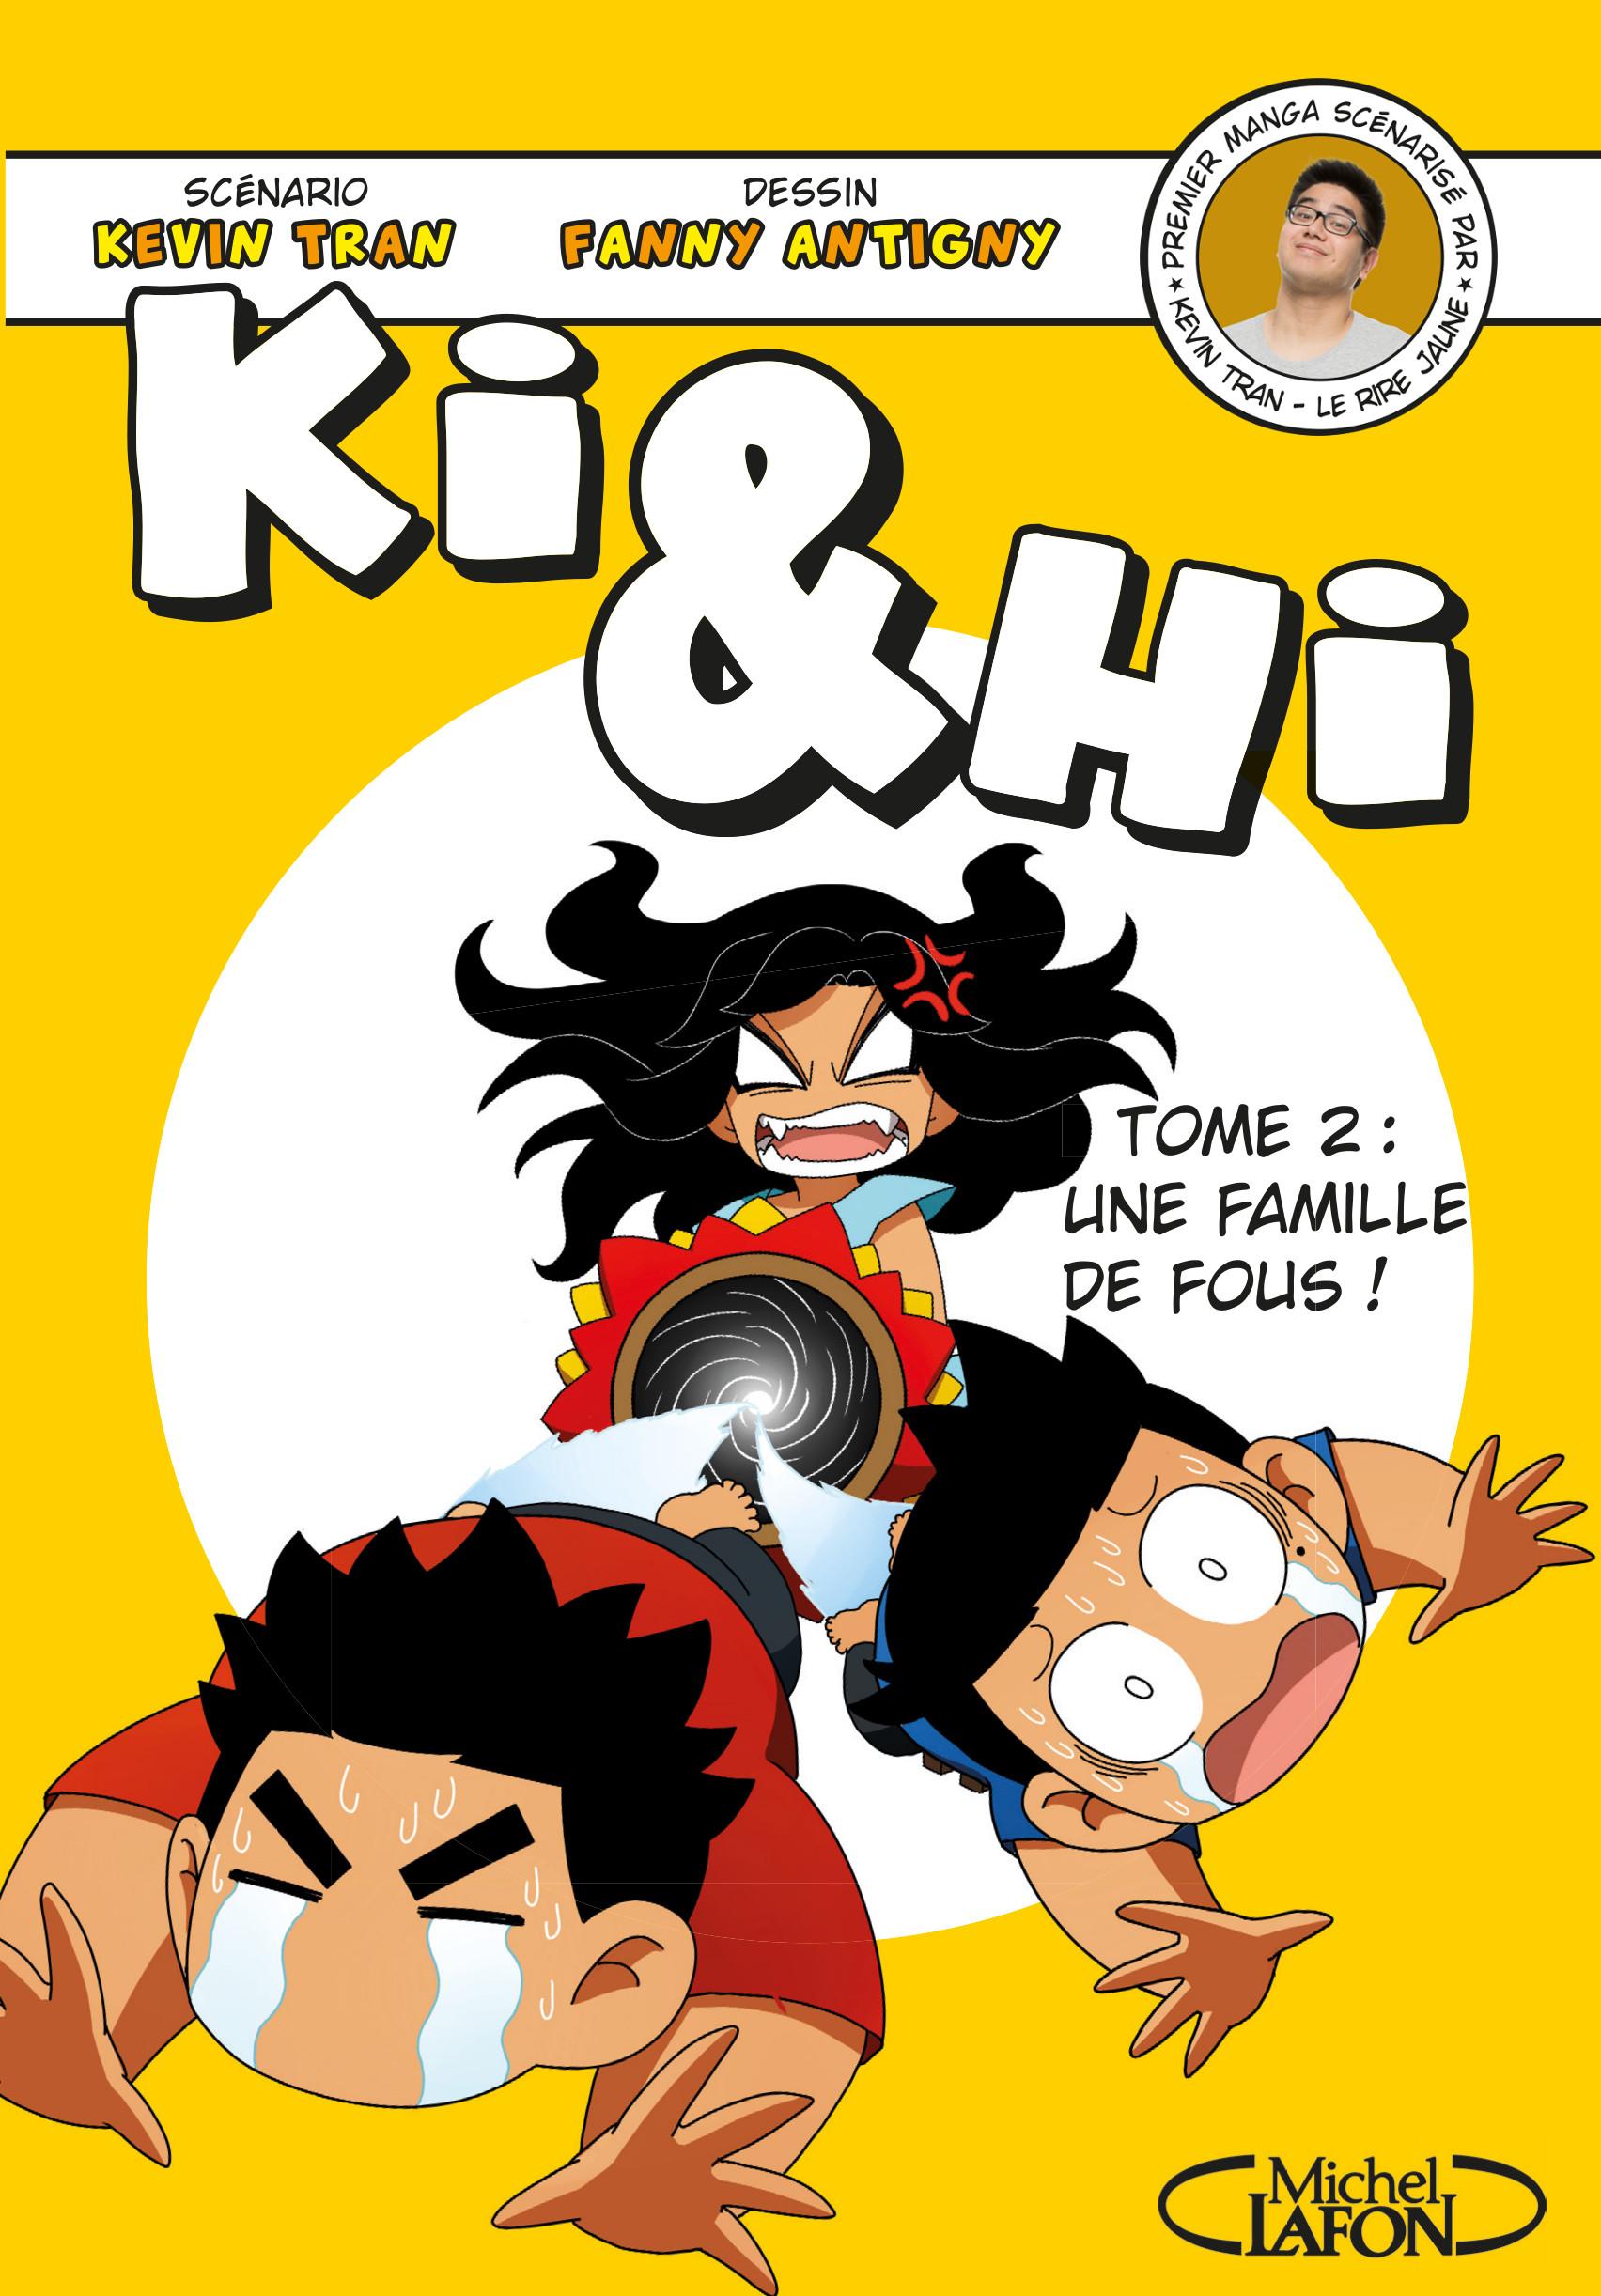 Ki Et Hi Tome 5 : Famille, Michel, Lafon